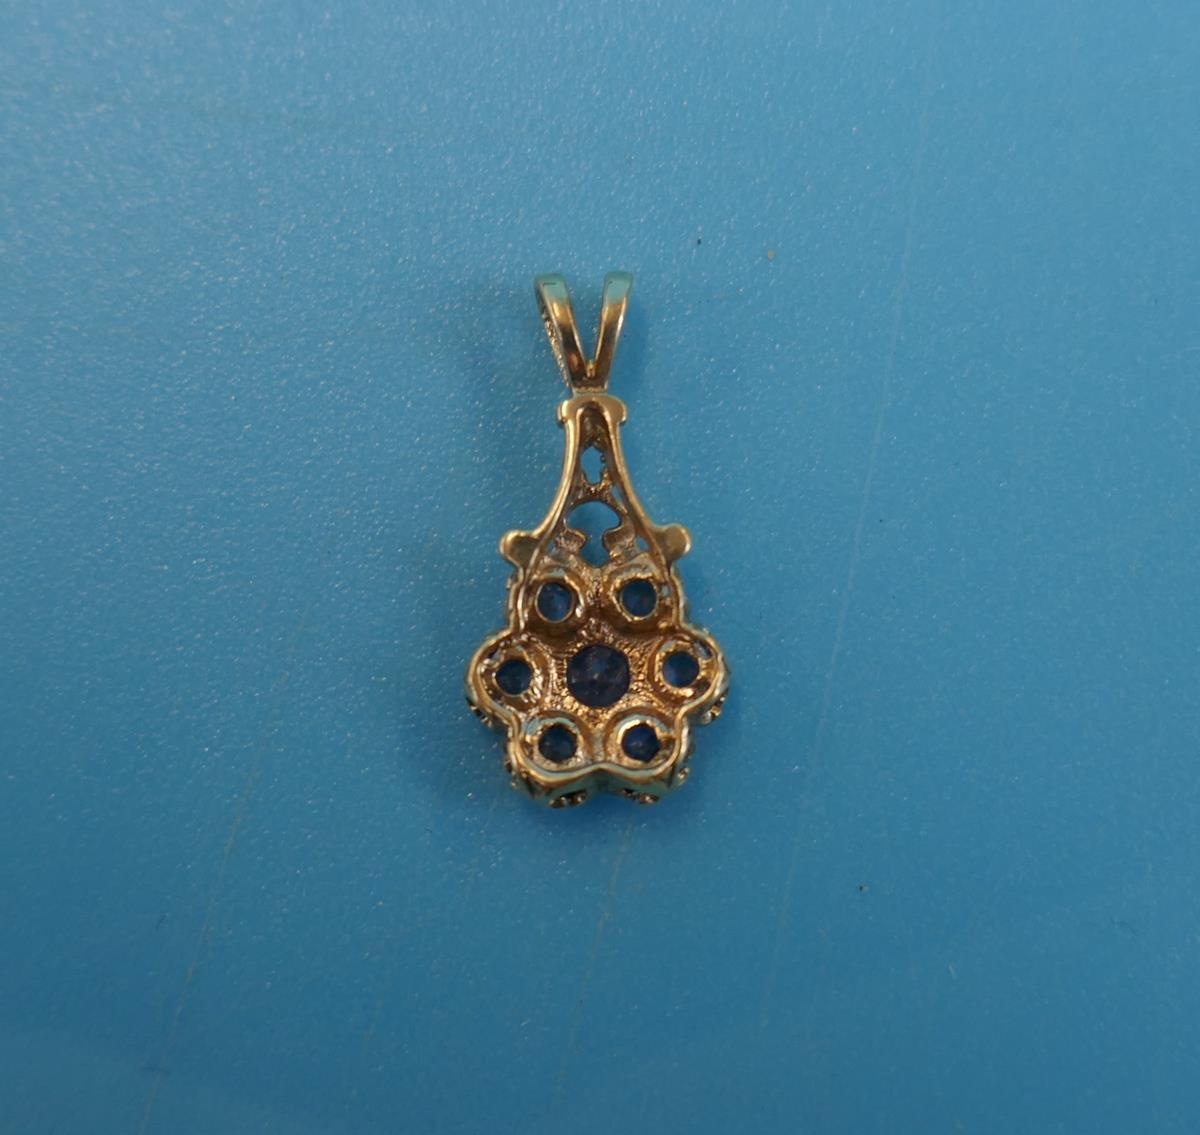 Gold sapphire set pendant - Image 3 of 3